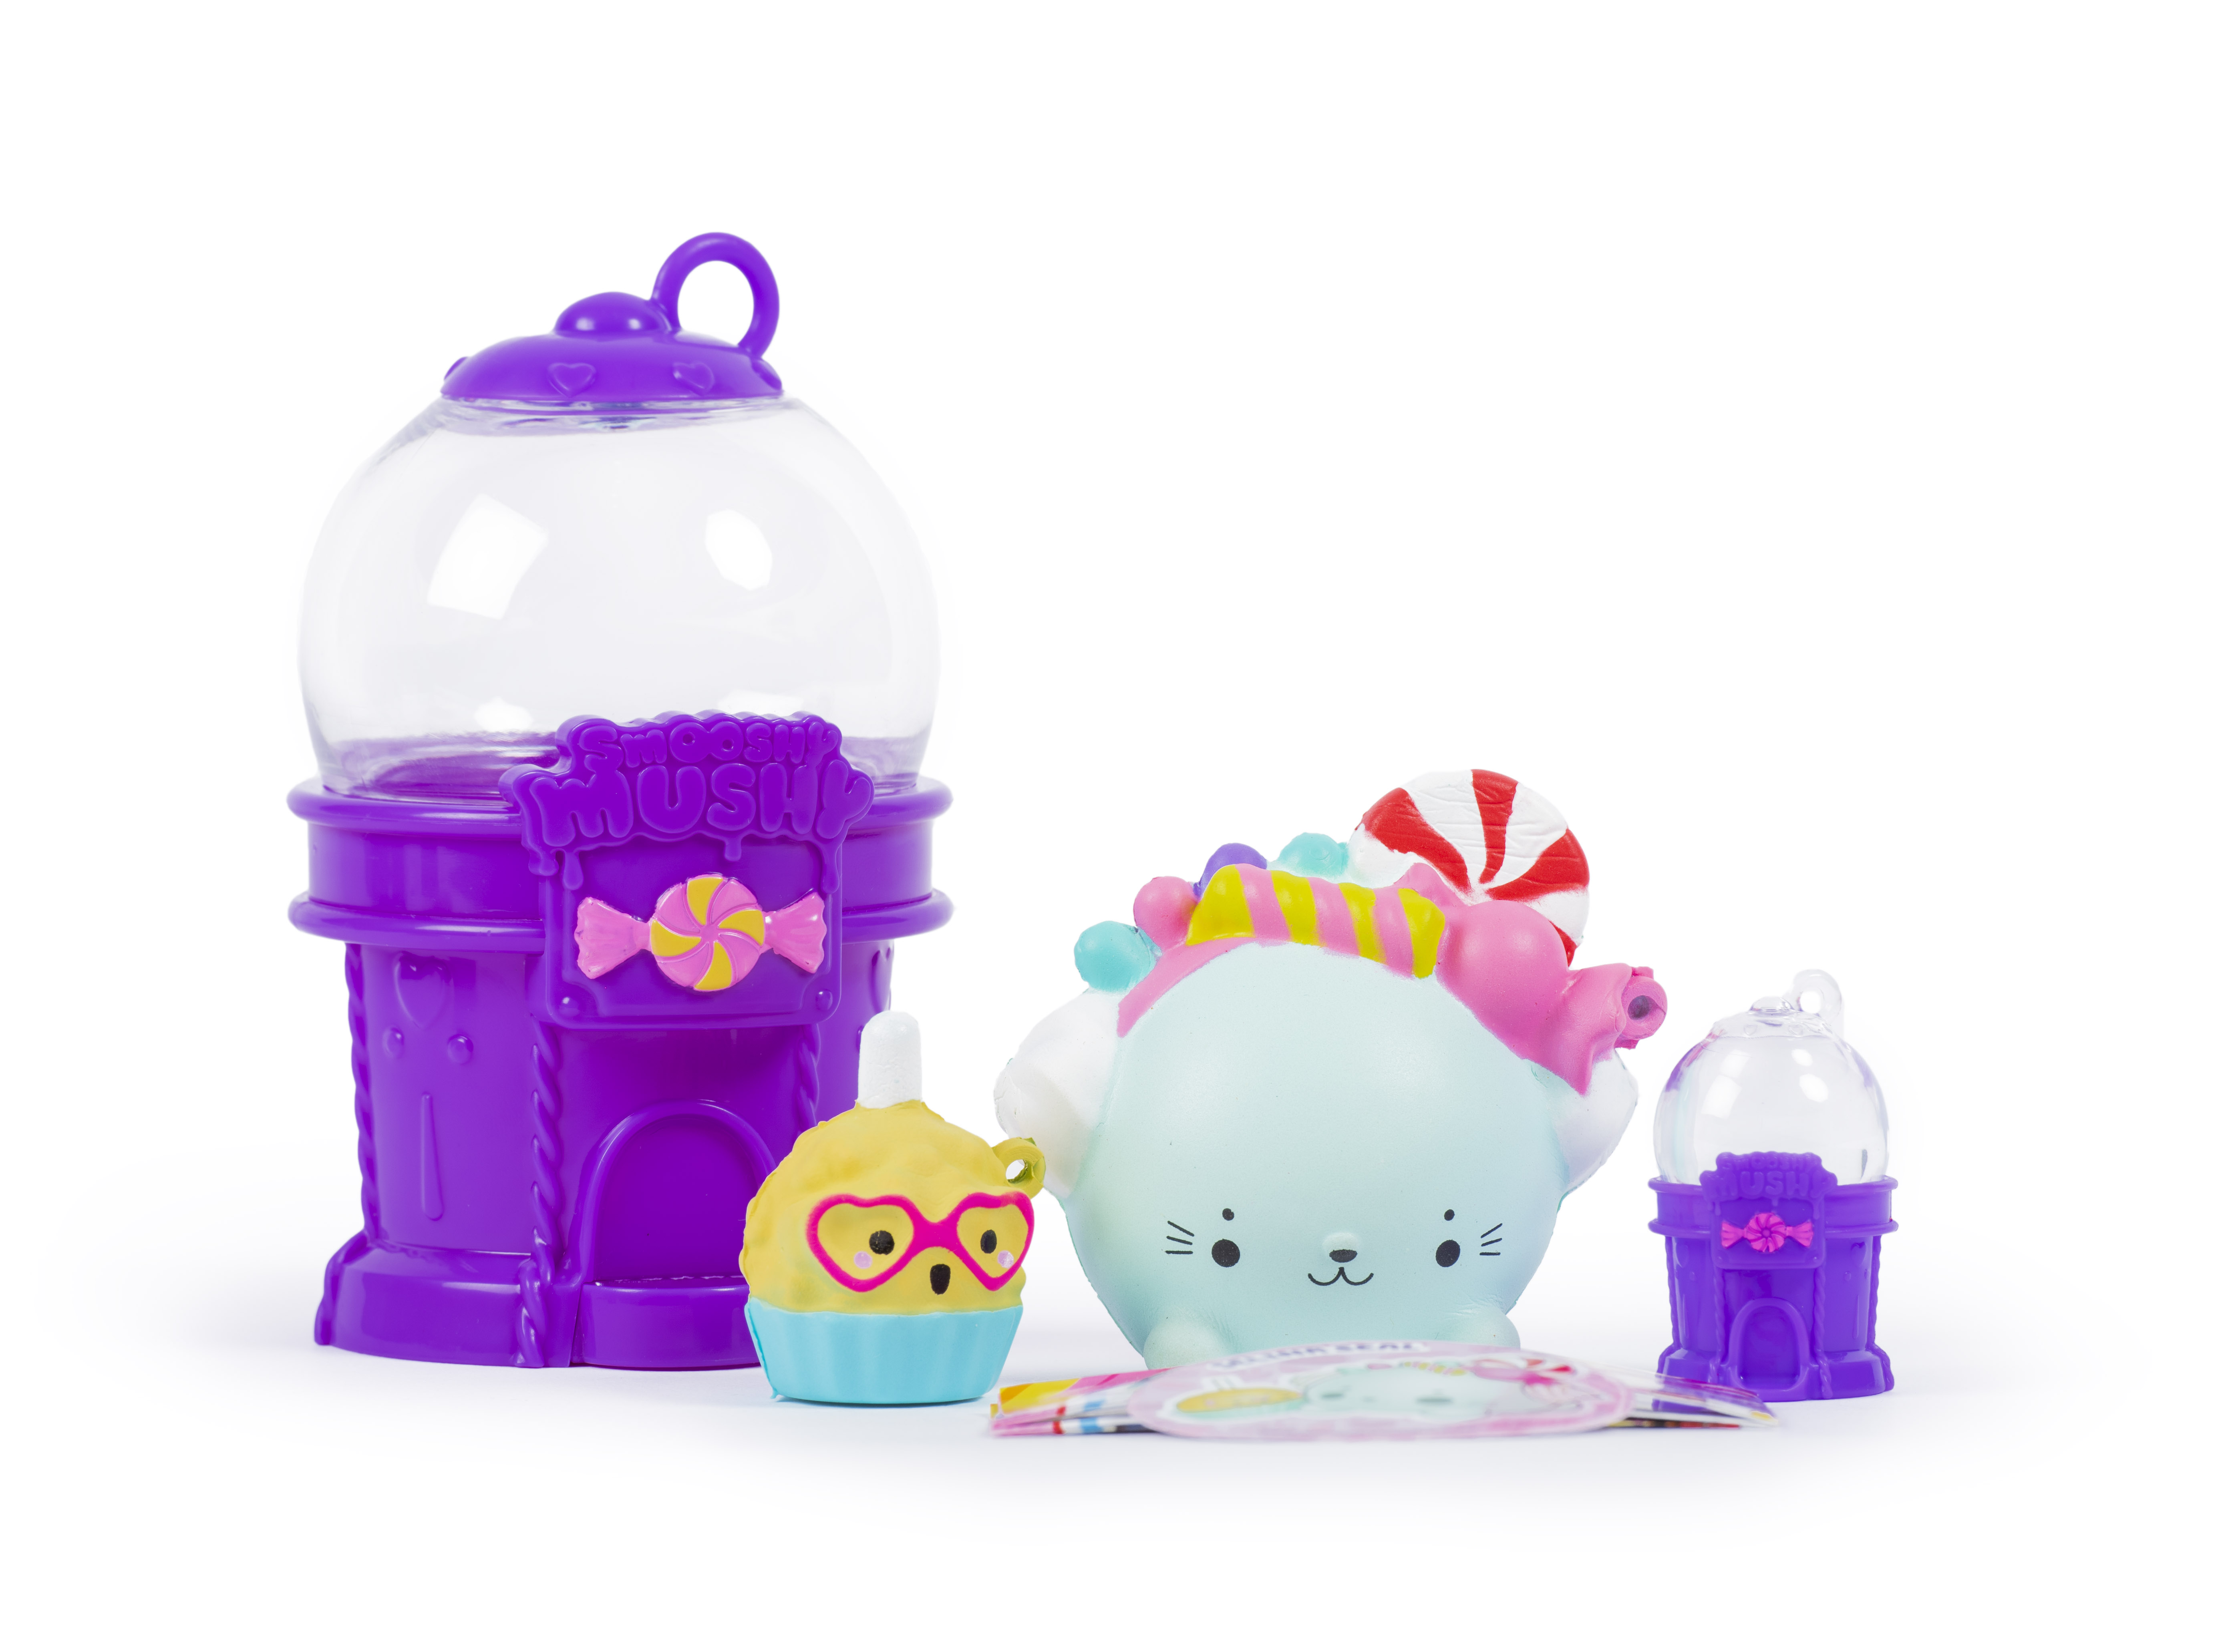 Purple NEW Smooshy Mushy Sugar Fix Series 5